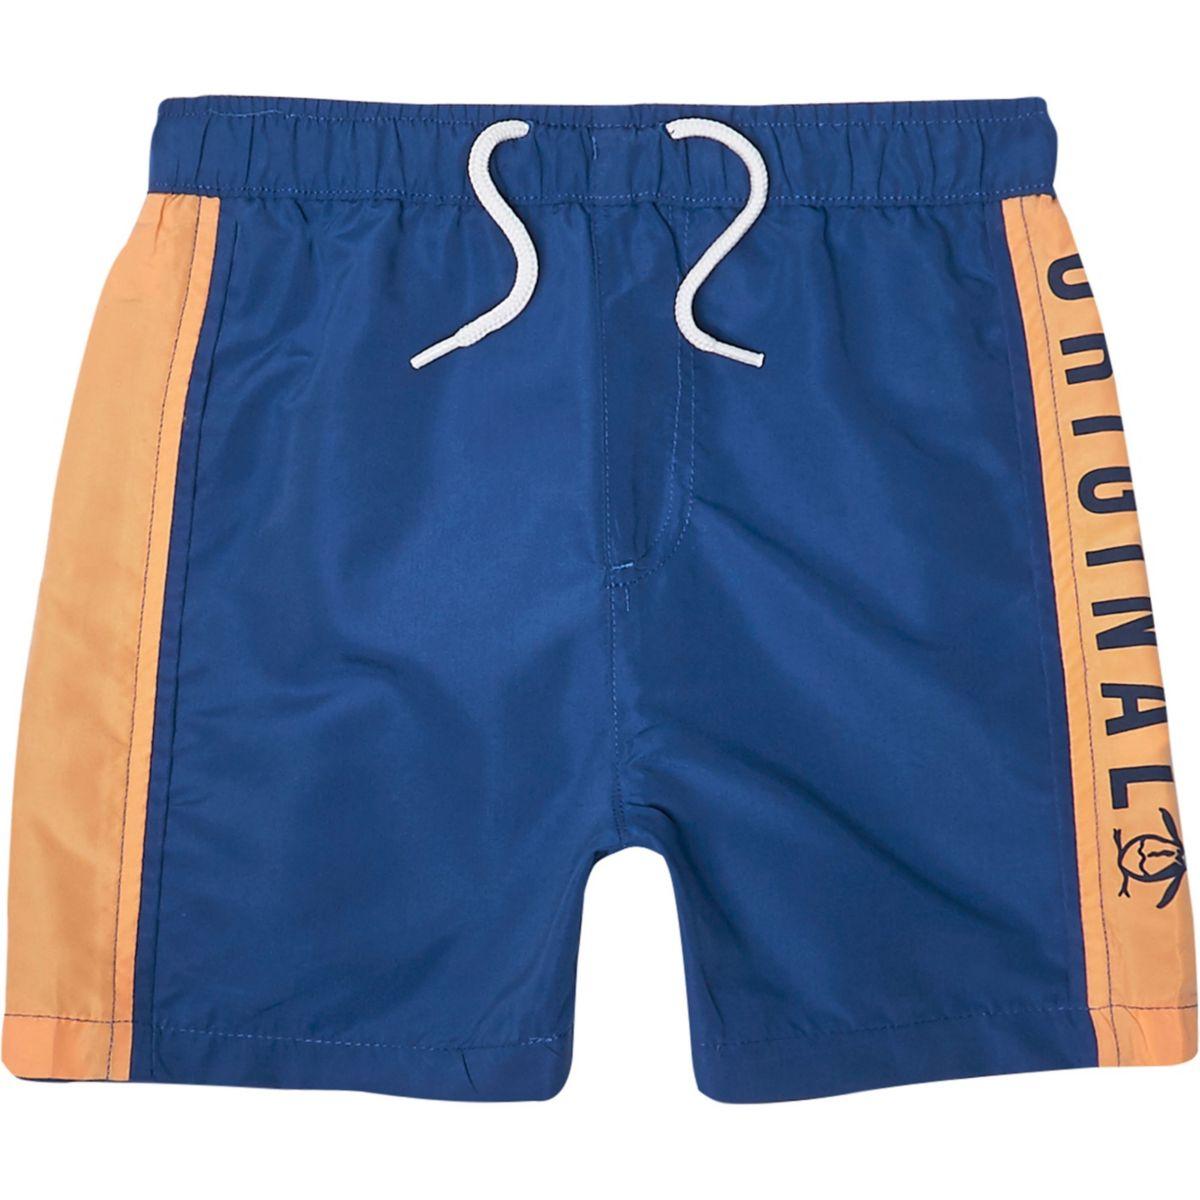 Boys blue Penguin Original swim shorts